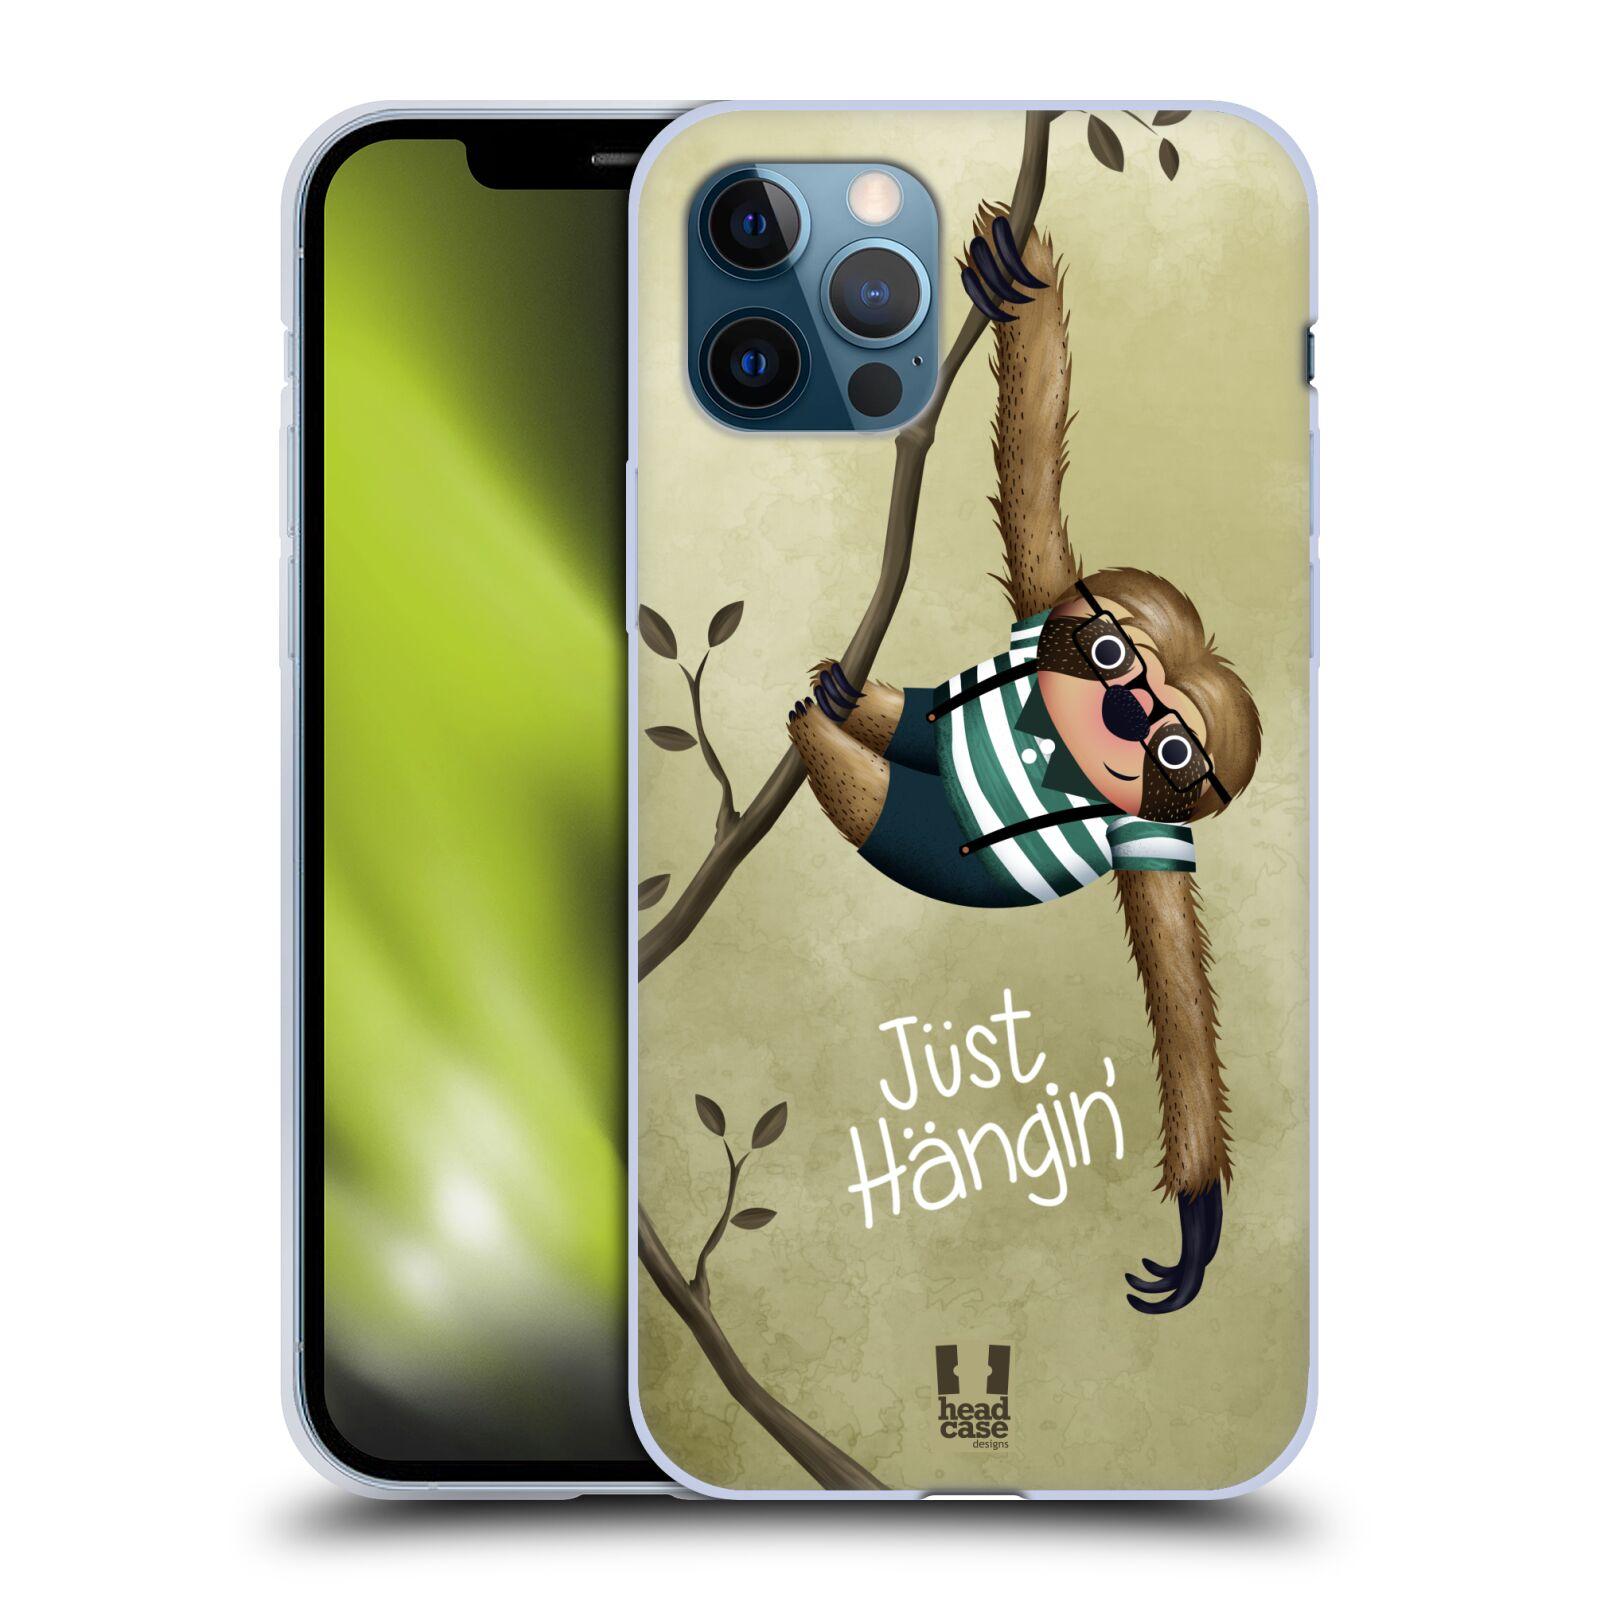 Silikonové pouzdro na mobil Apple iPhone 12 / 12 Pro - Head Case - Lenochod Just Hangin